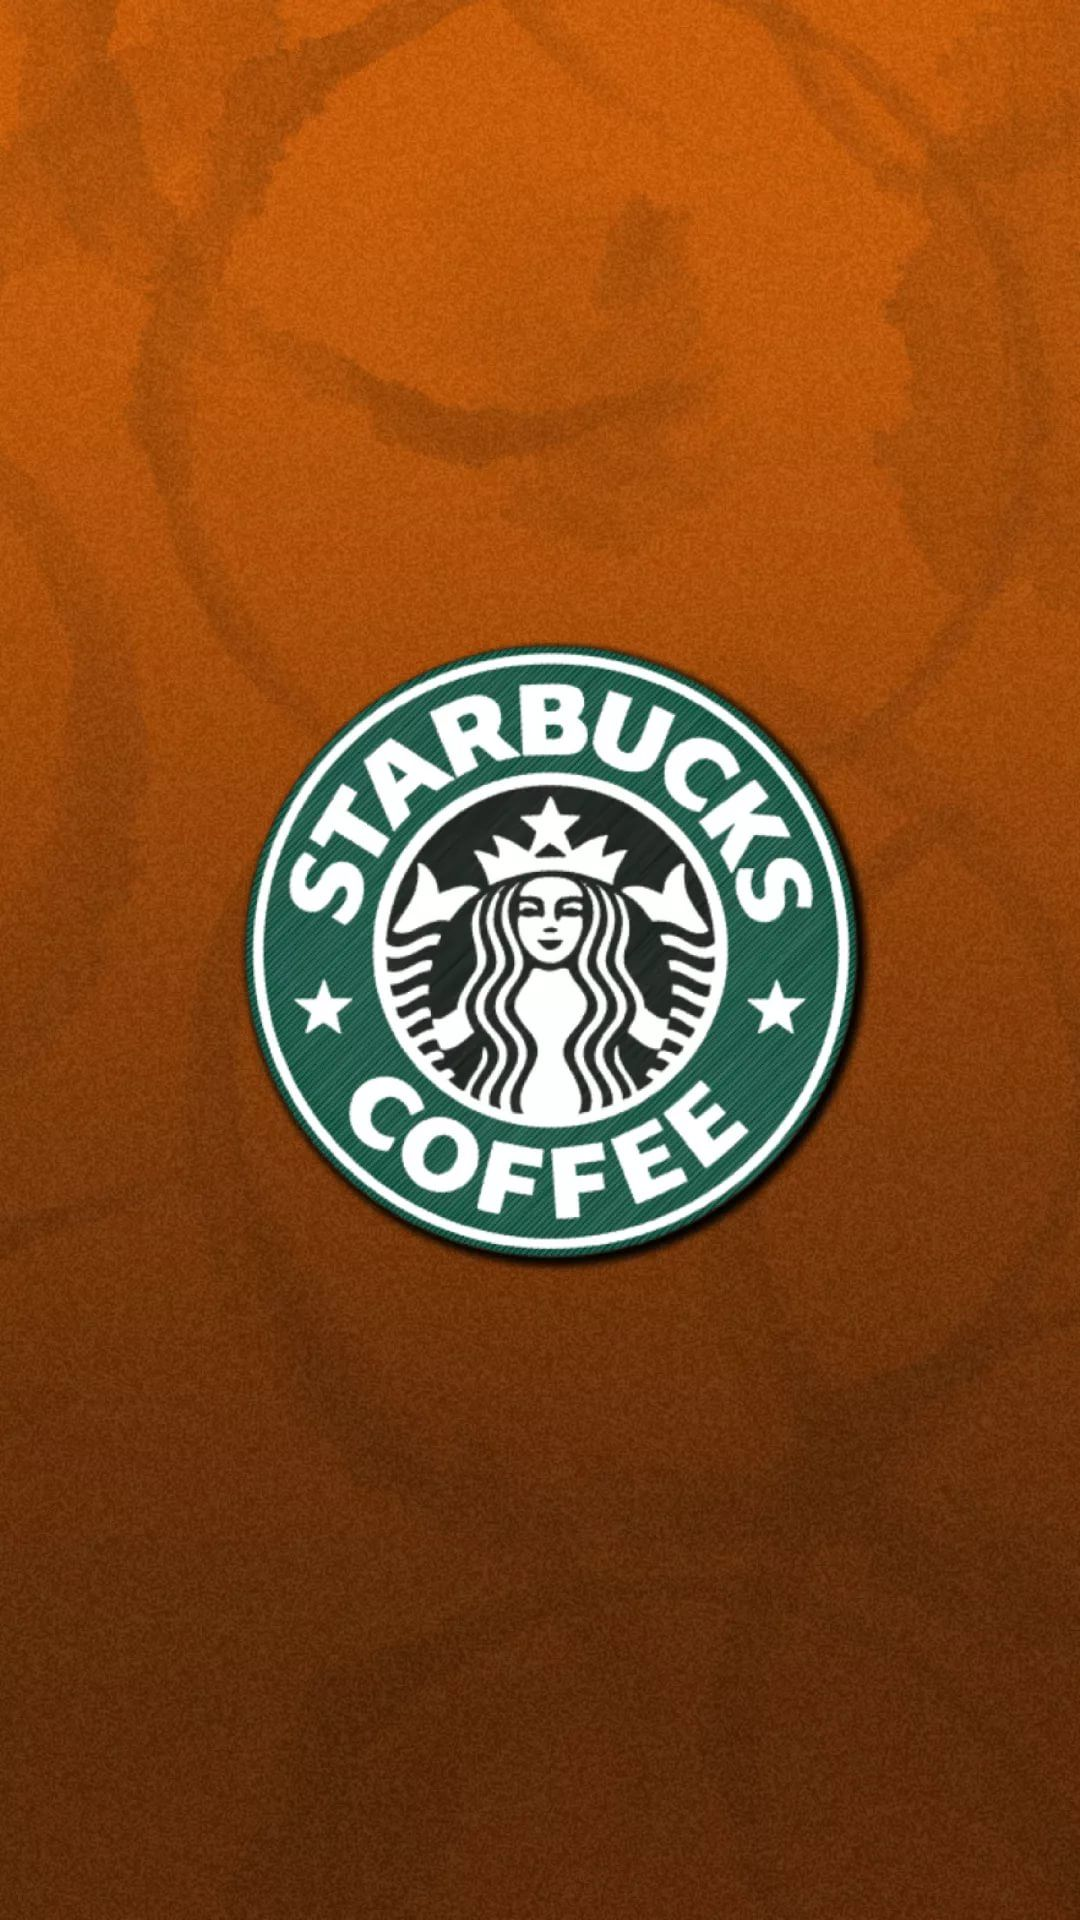 Starbucks Iphone Wallpapers Wallpaperboat